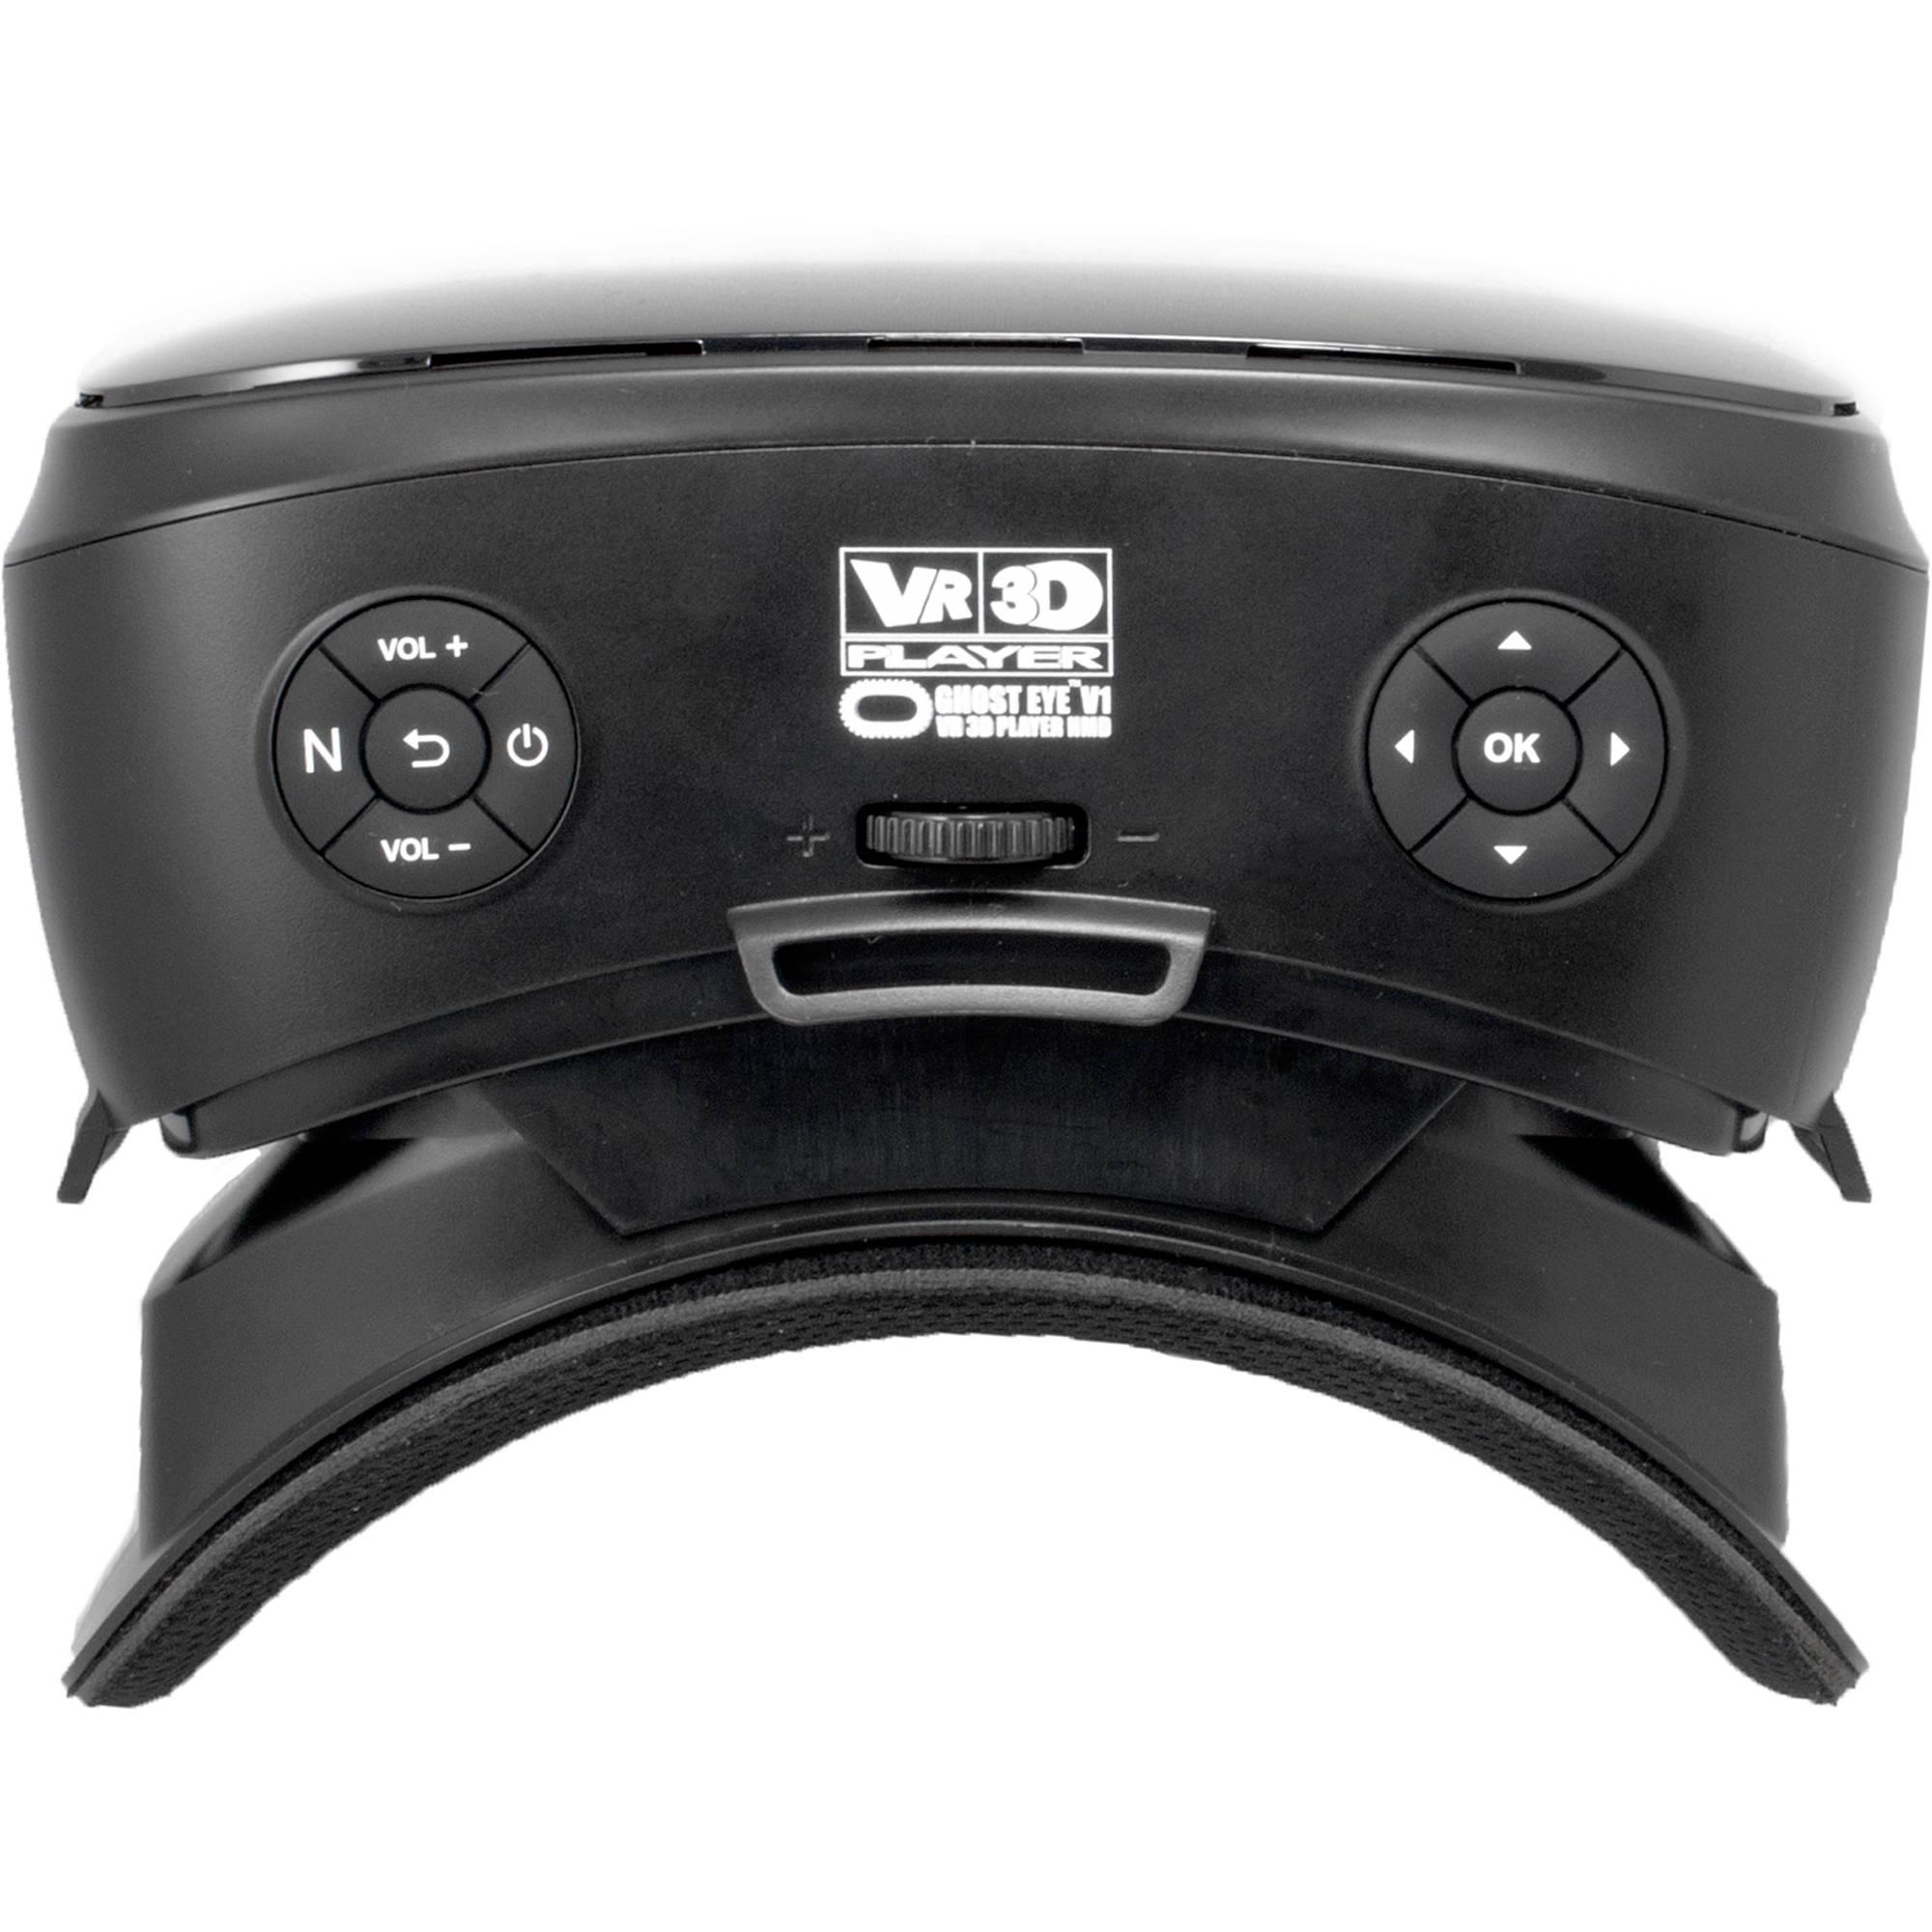 Https C Product 1304391 Reg New Beat Street Esp Black Solo Cinegears Ci7106 Ghost Eye V1 Vr 1304464